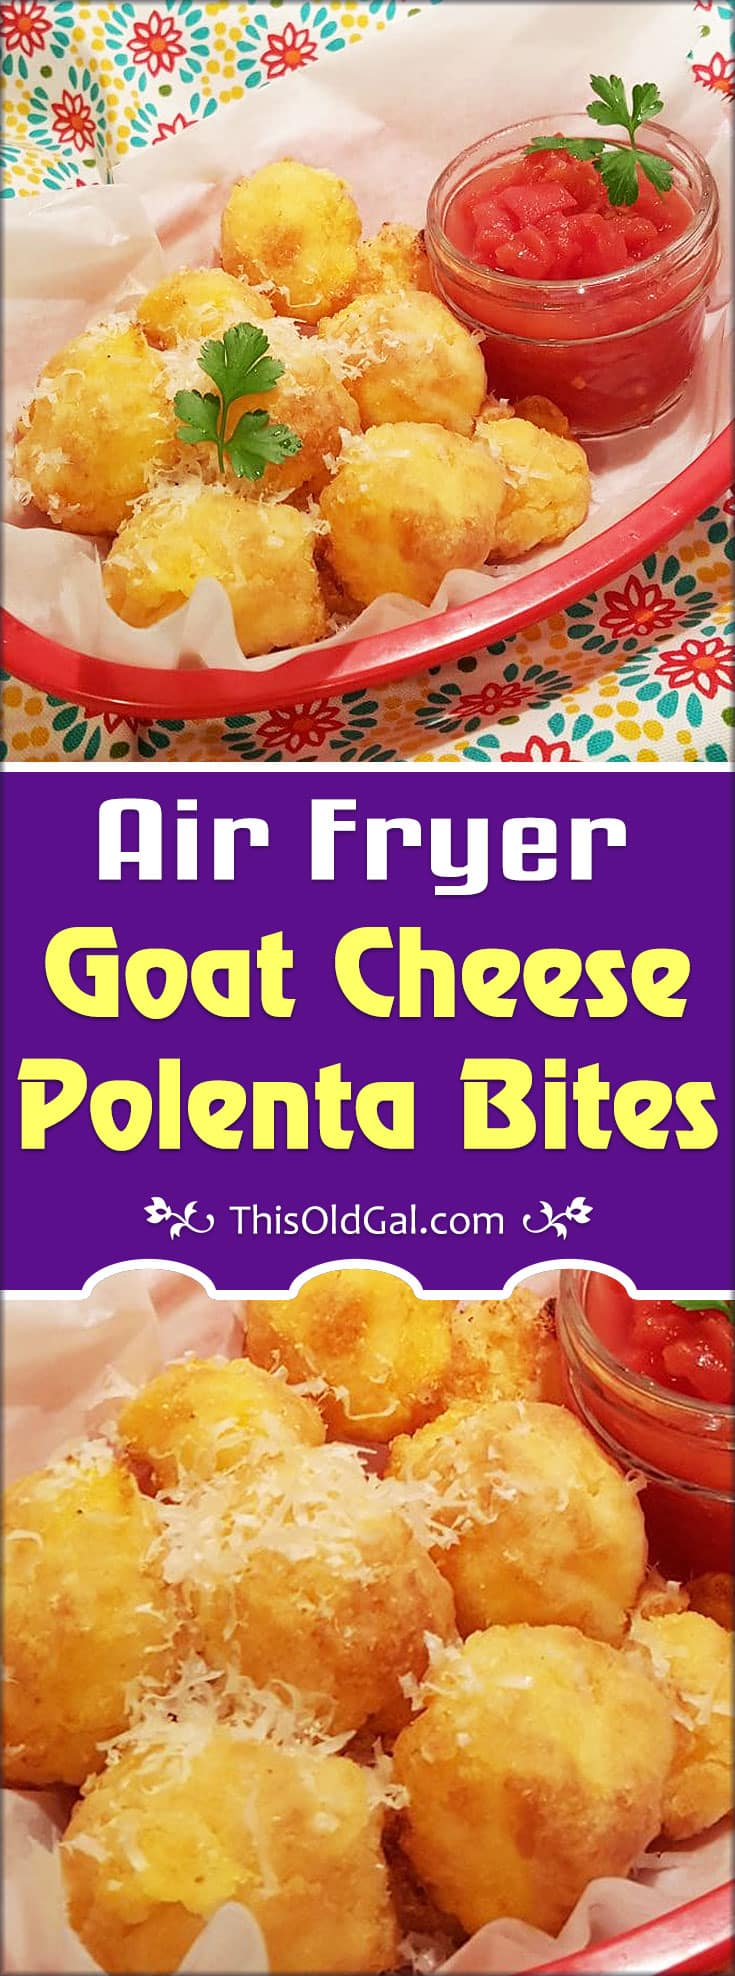 Air Fryer Goat Cheese Polenta Bites